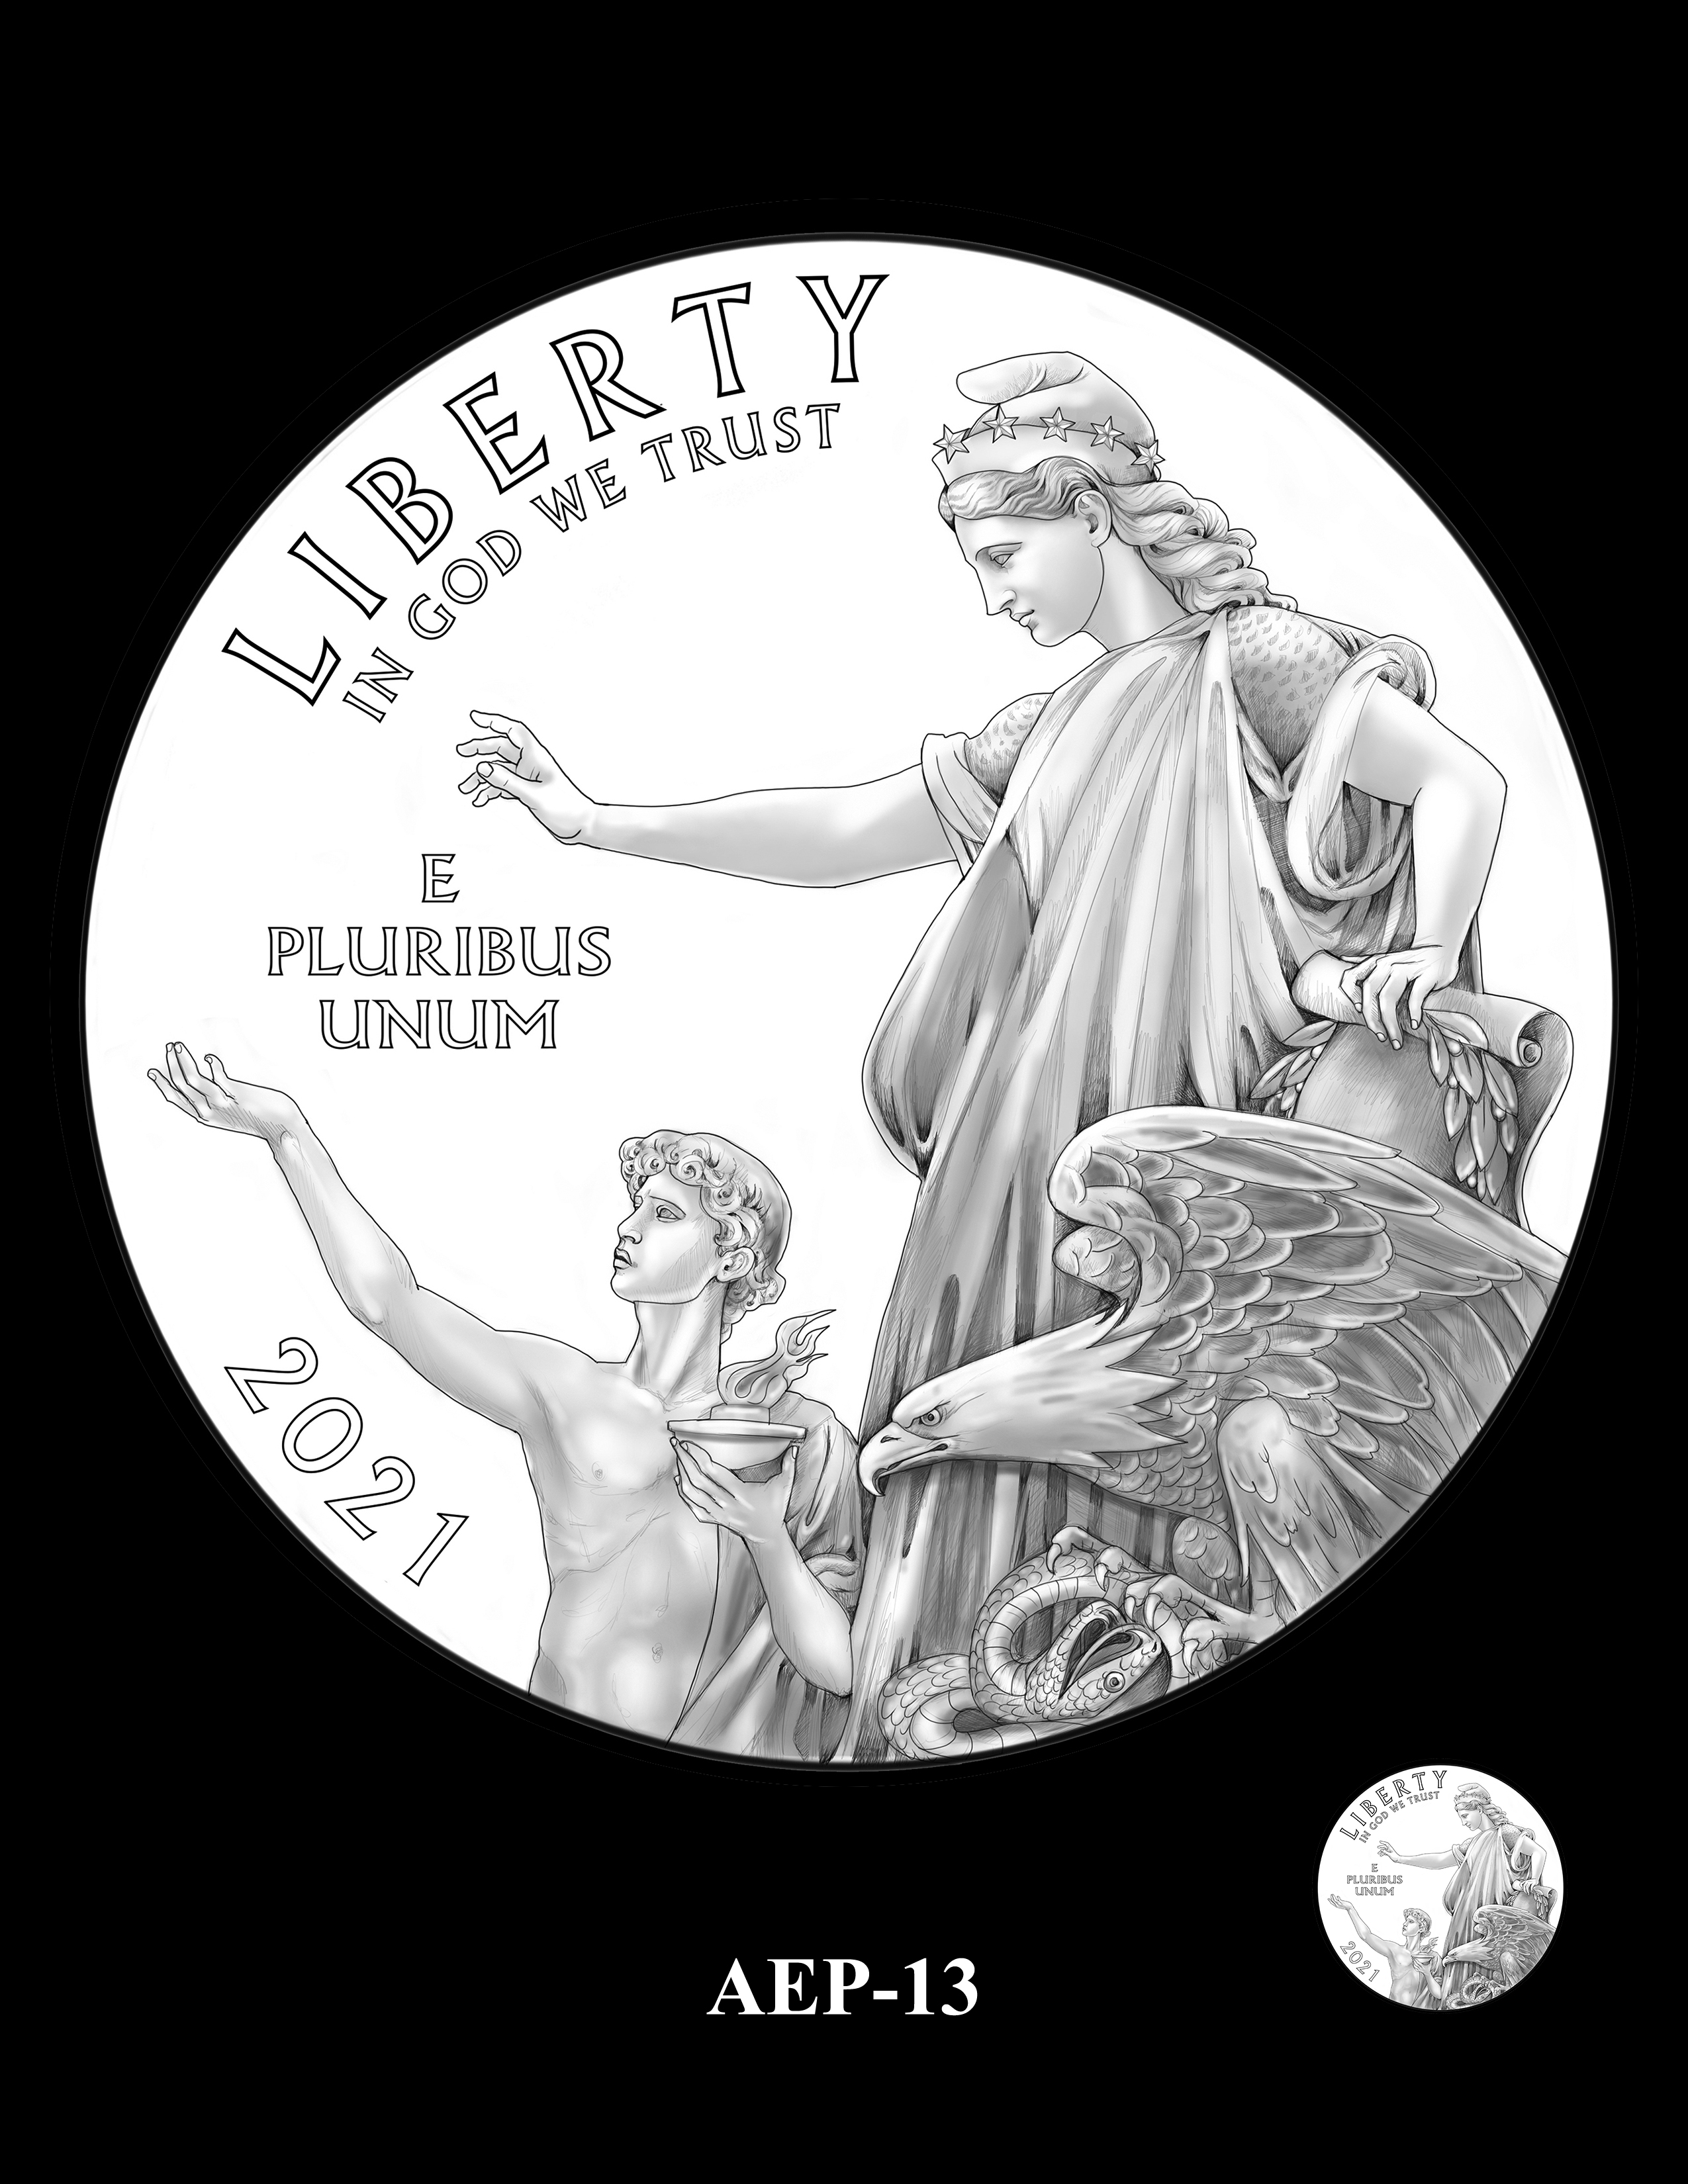 AEP-13 -- 2021 American Eagle Platinum Proof Program